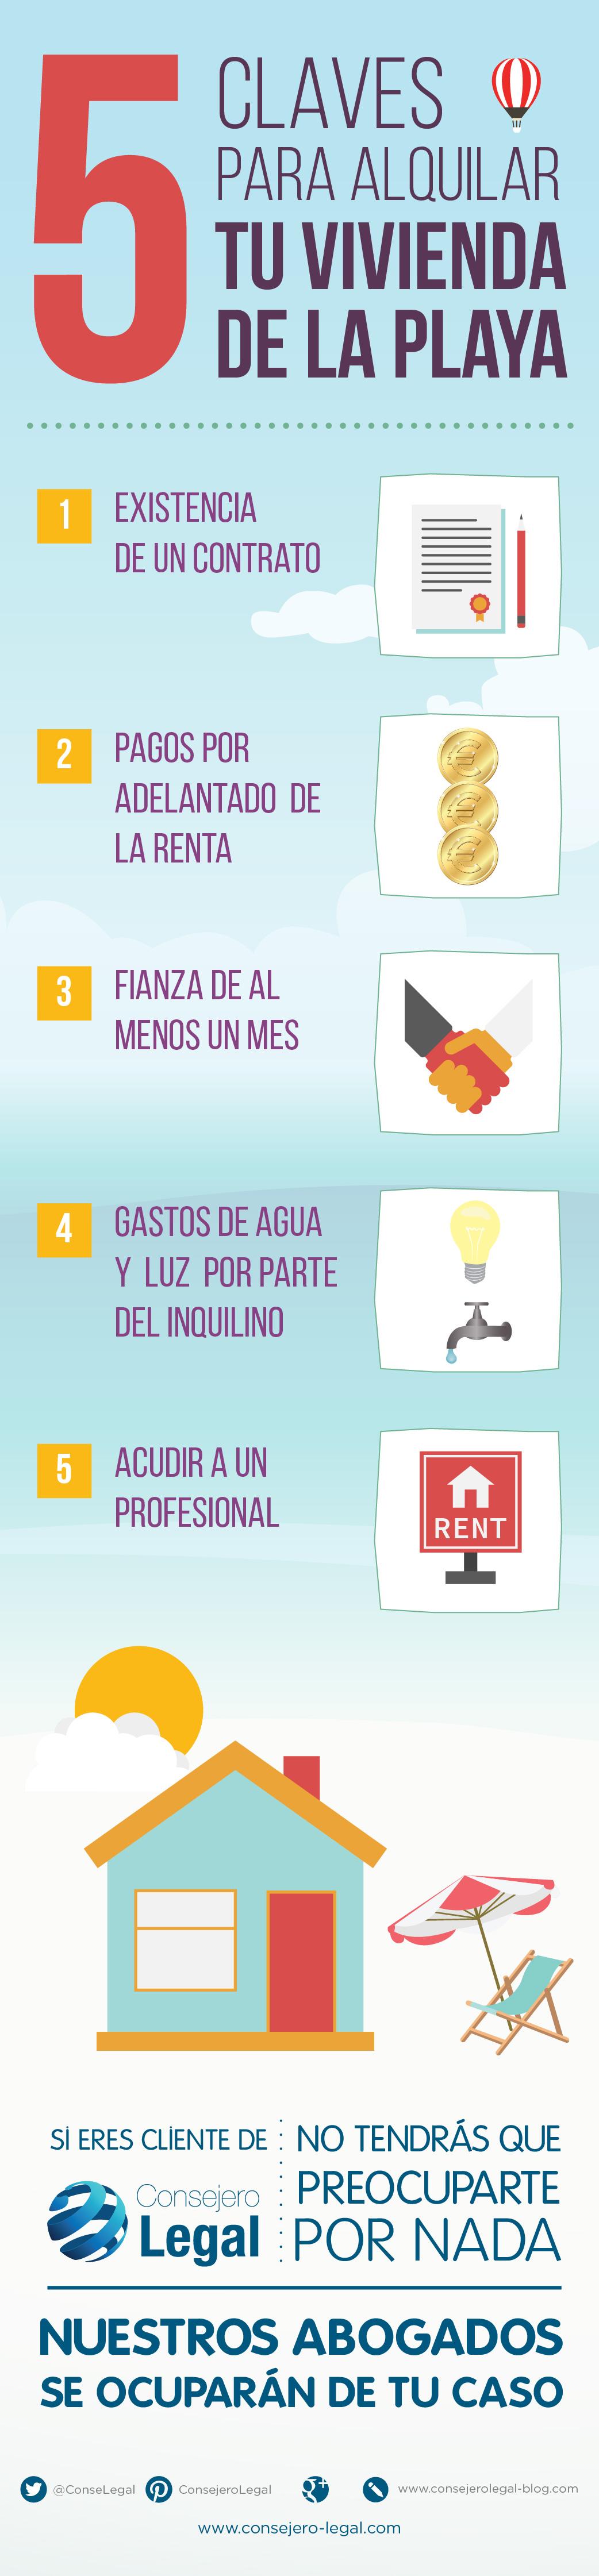 5 consejos para alquilar un piso infograf a consejero legal infograf as legales pinterest - Tramites legales para alquilar un piso ...